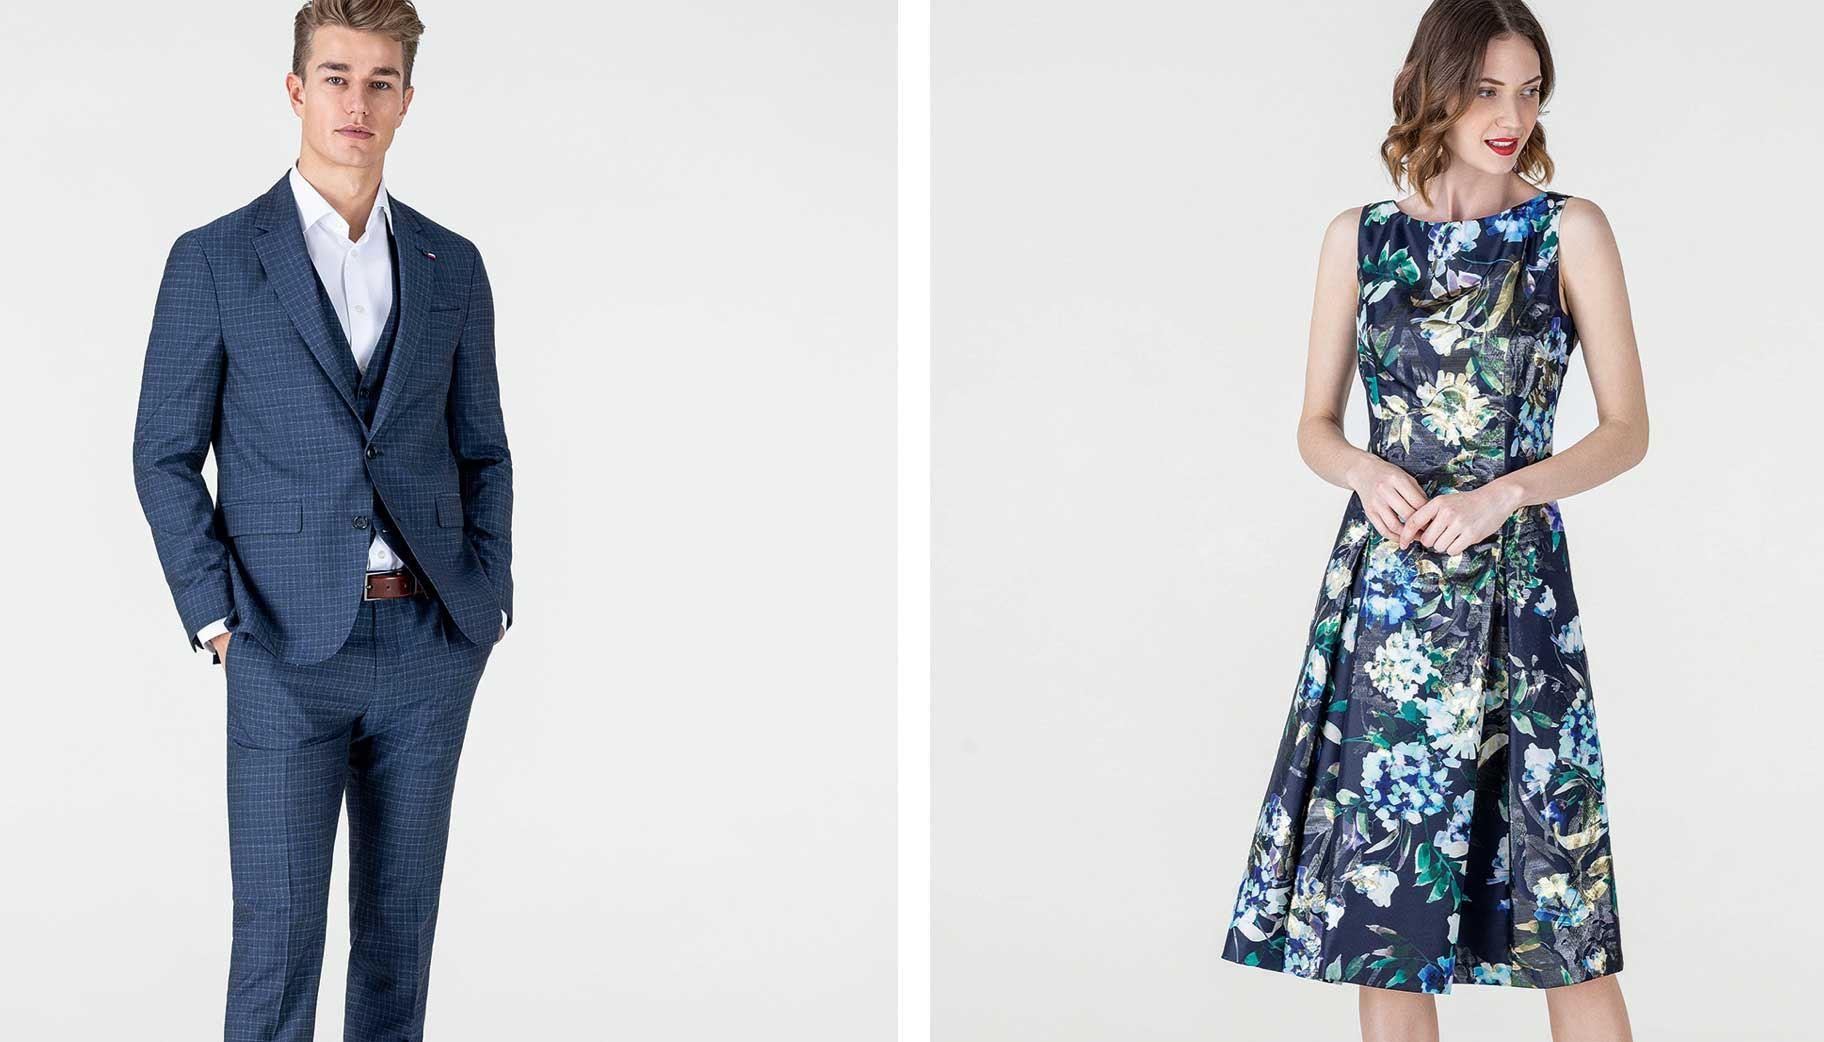 Pkz.ch | Fashion Online-Shop | Grosse Auswahl An Top-Marken